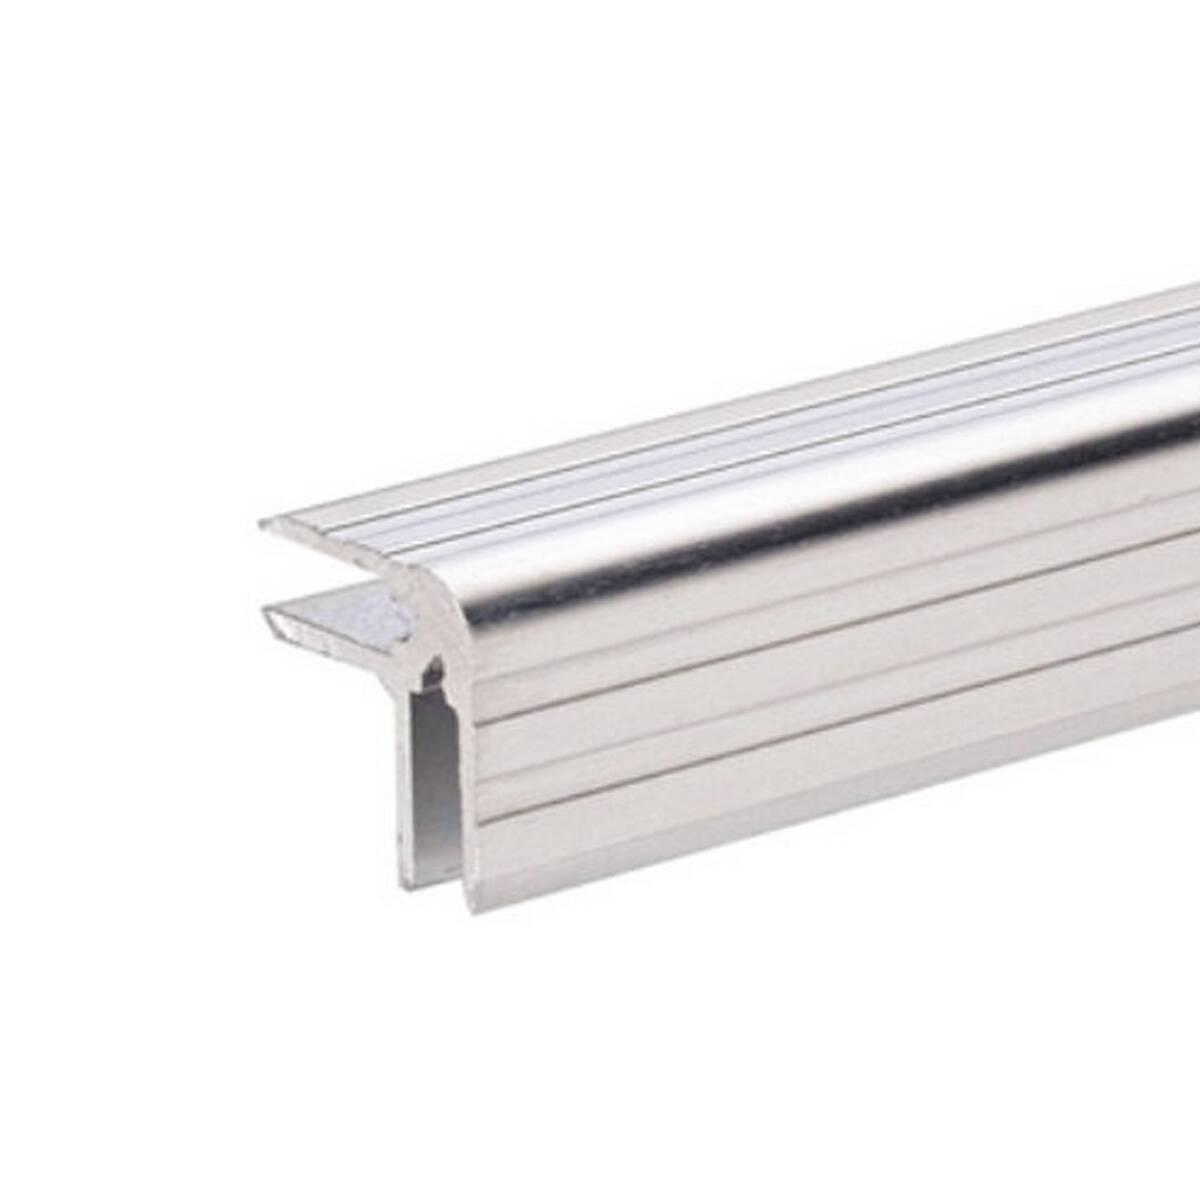 adam hall 6137 aluminium casemaker 4 5 mm einschub. Black Bedroom Furniture Sets. Home Design Ideas